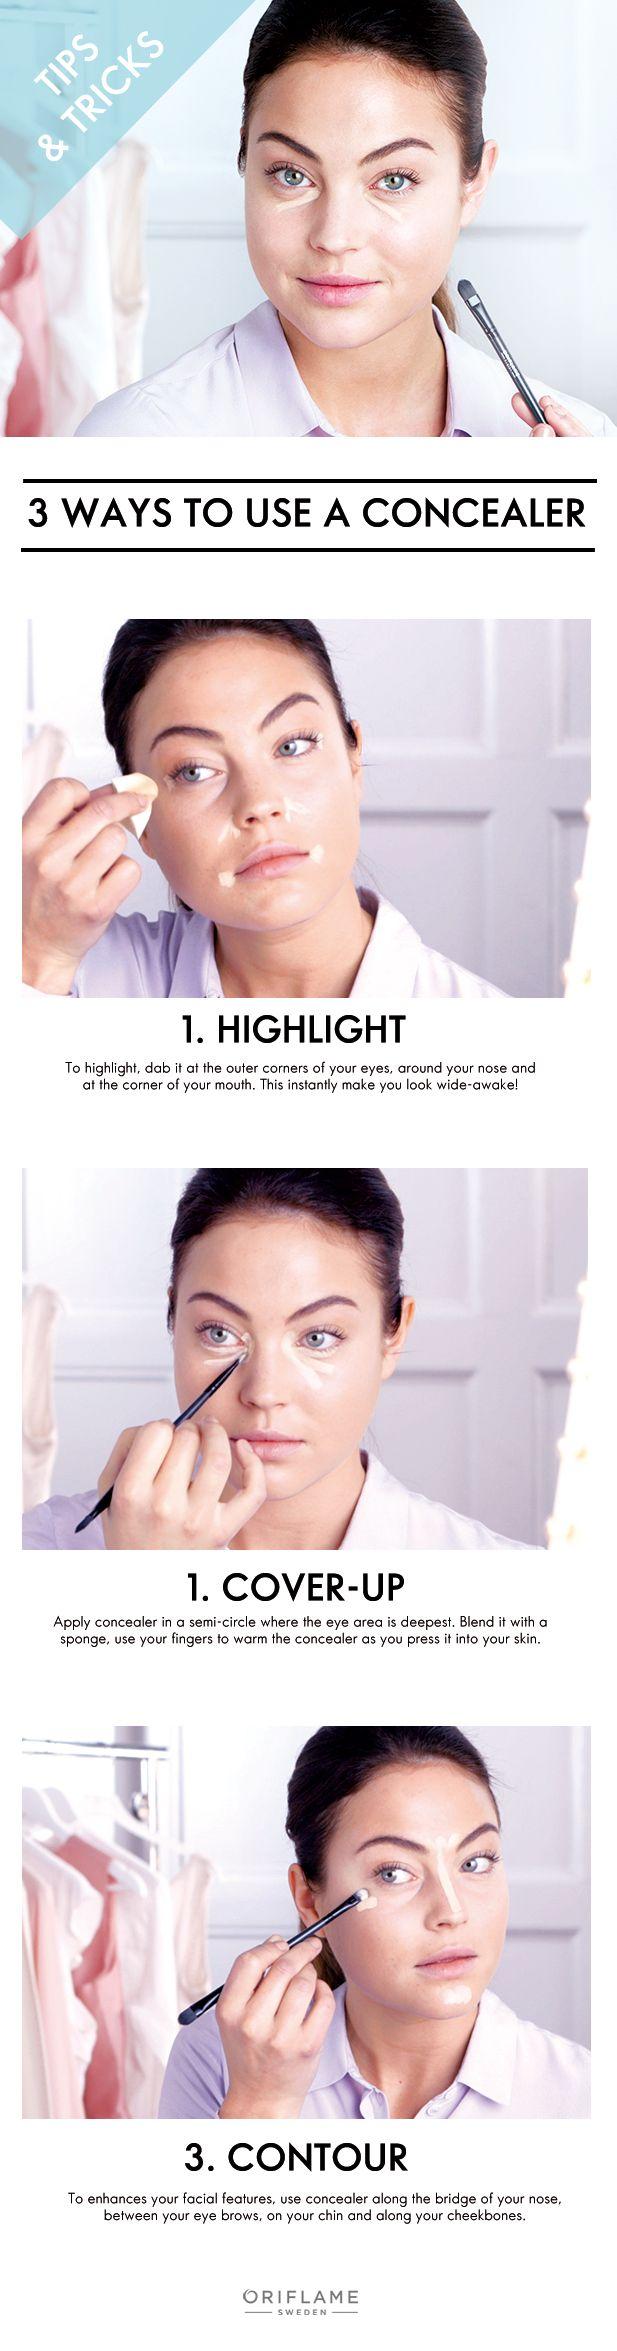 3 ways to use a concealer! #tips #oriflame #concealer